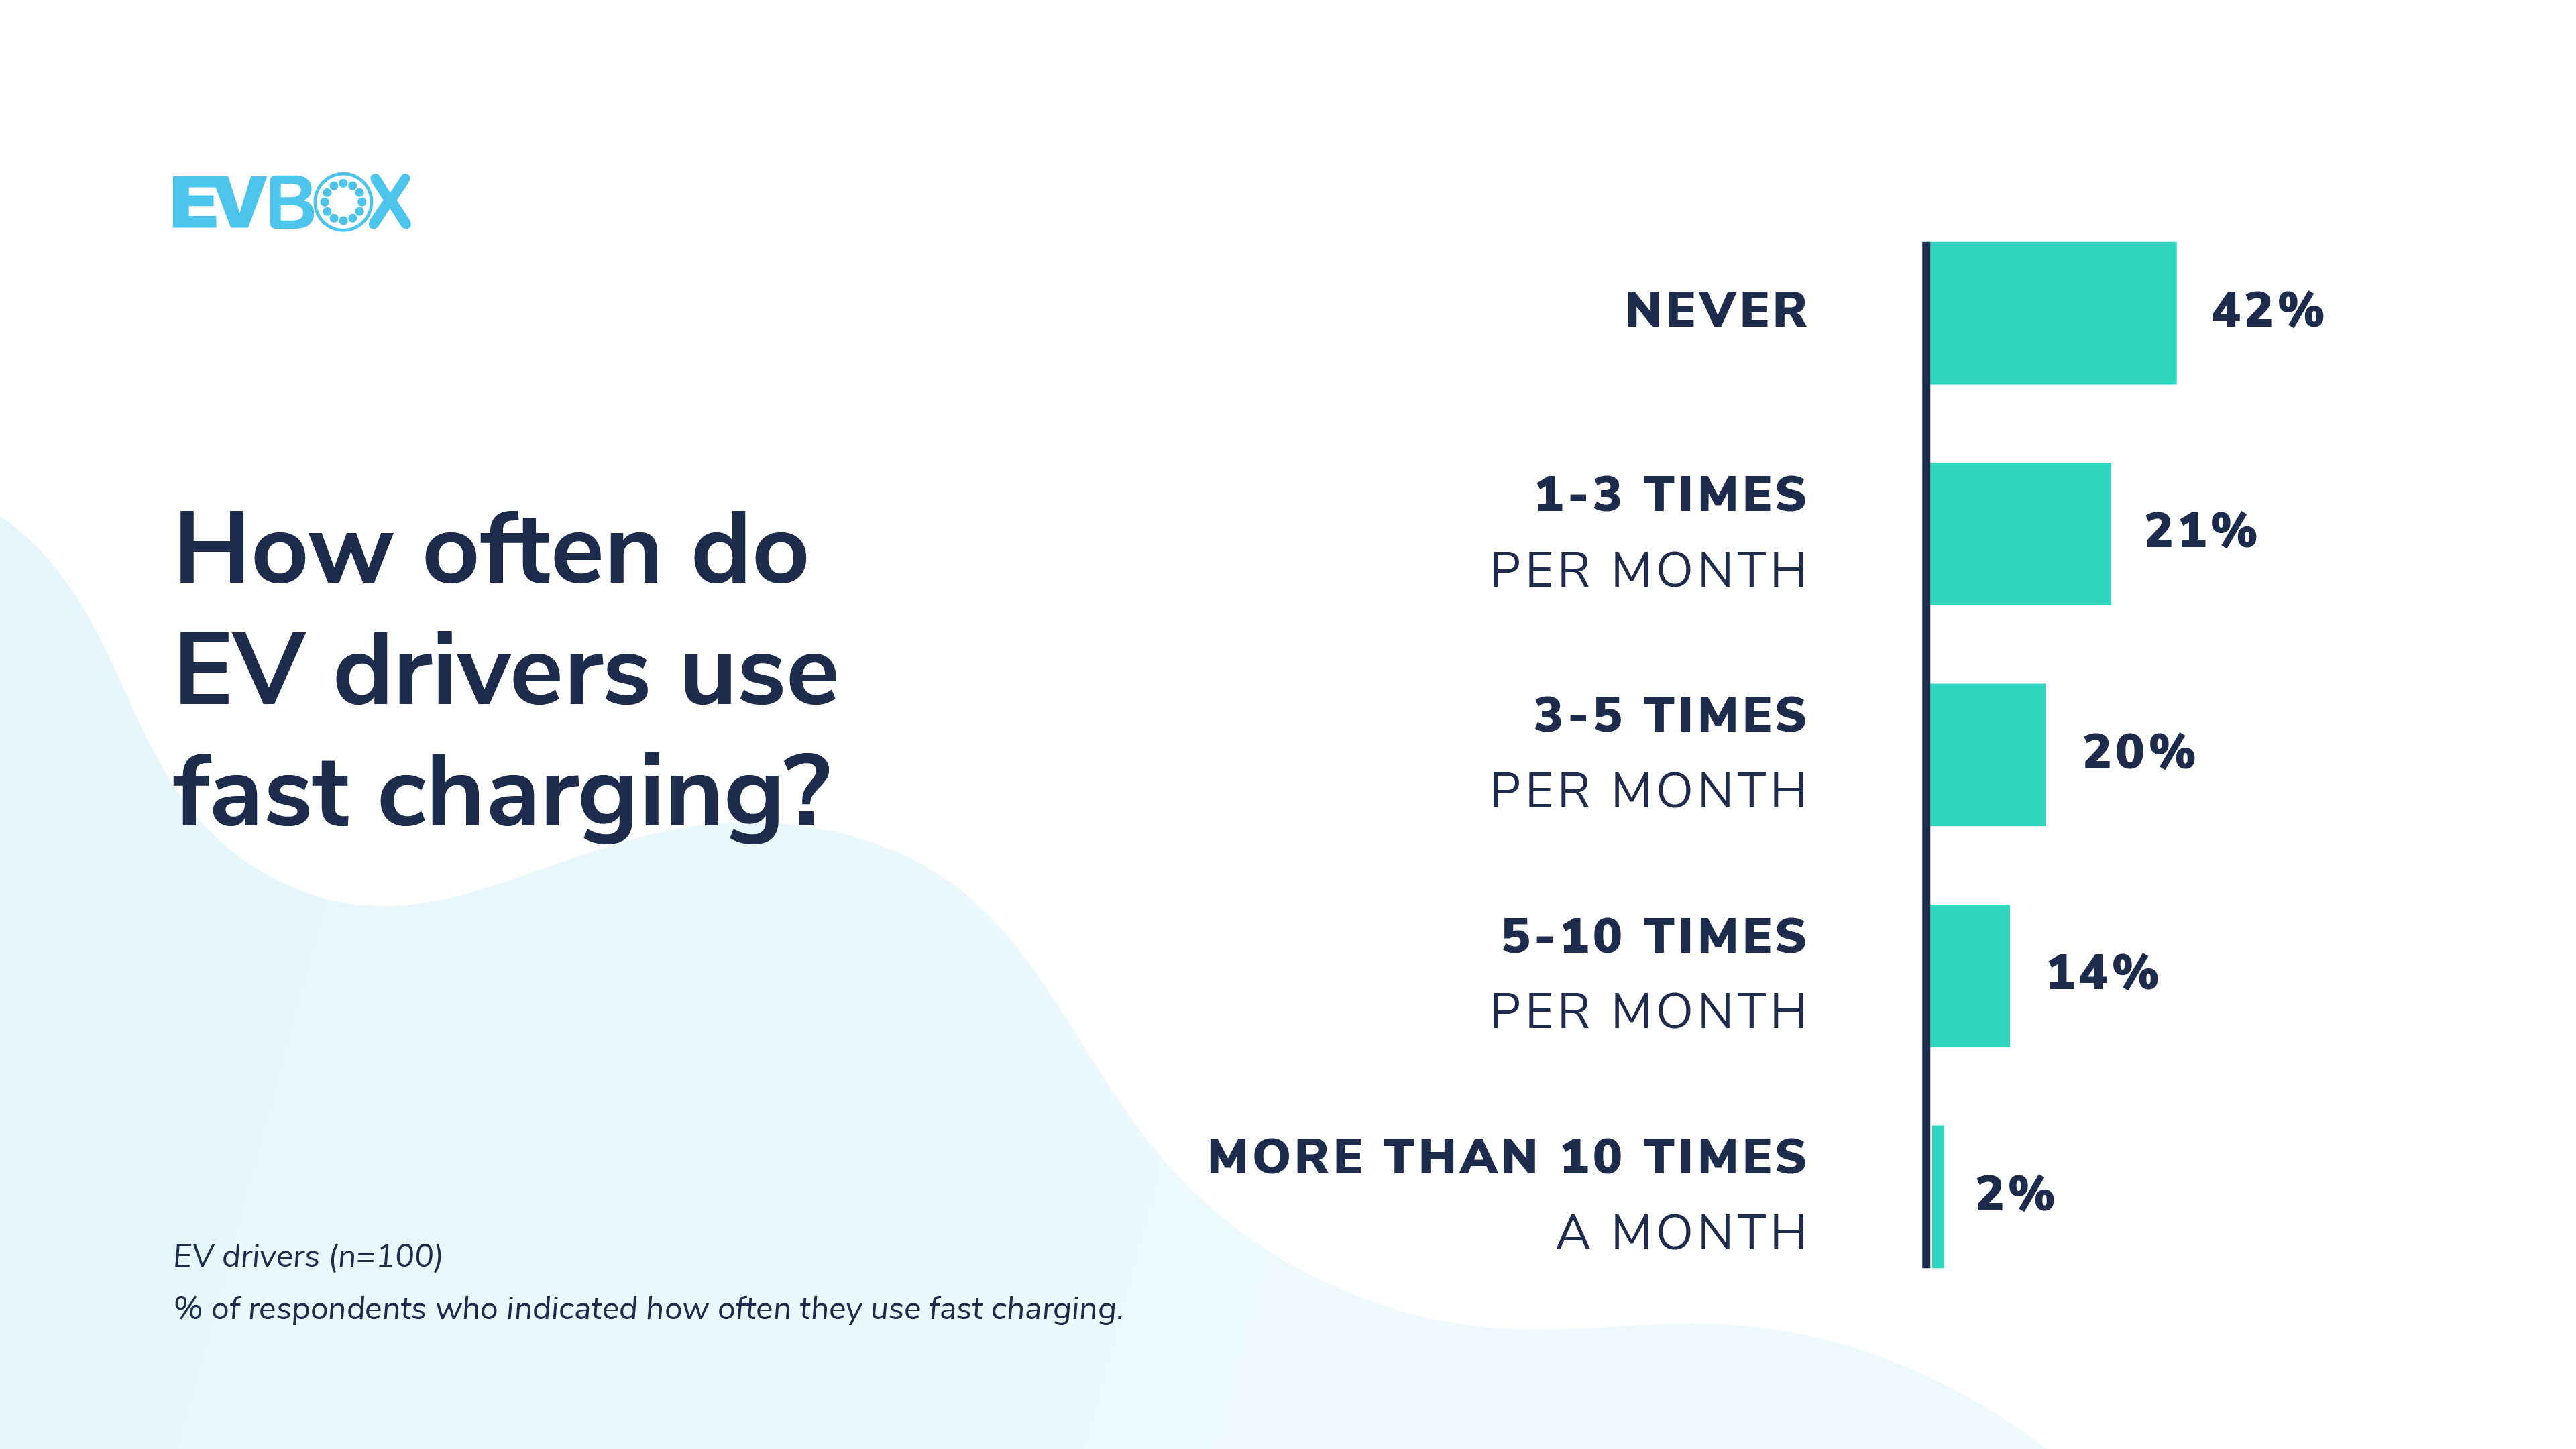 Fast charging usage